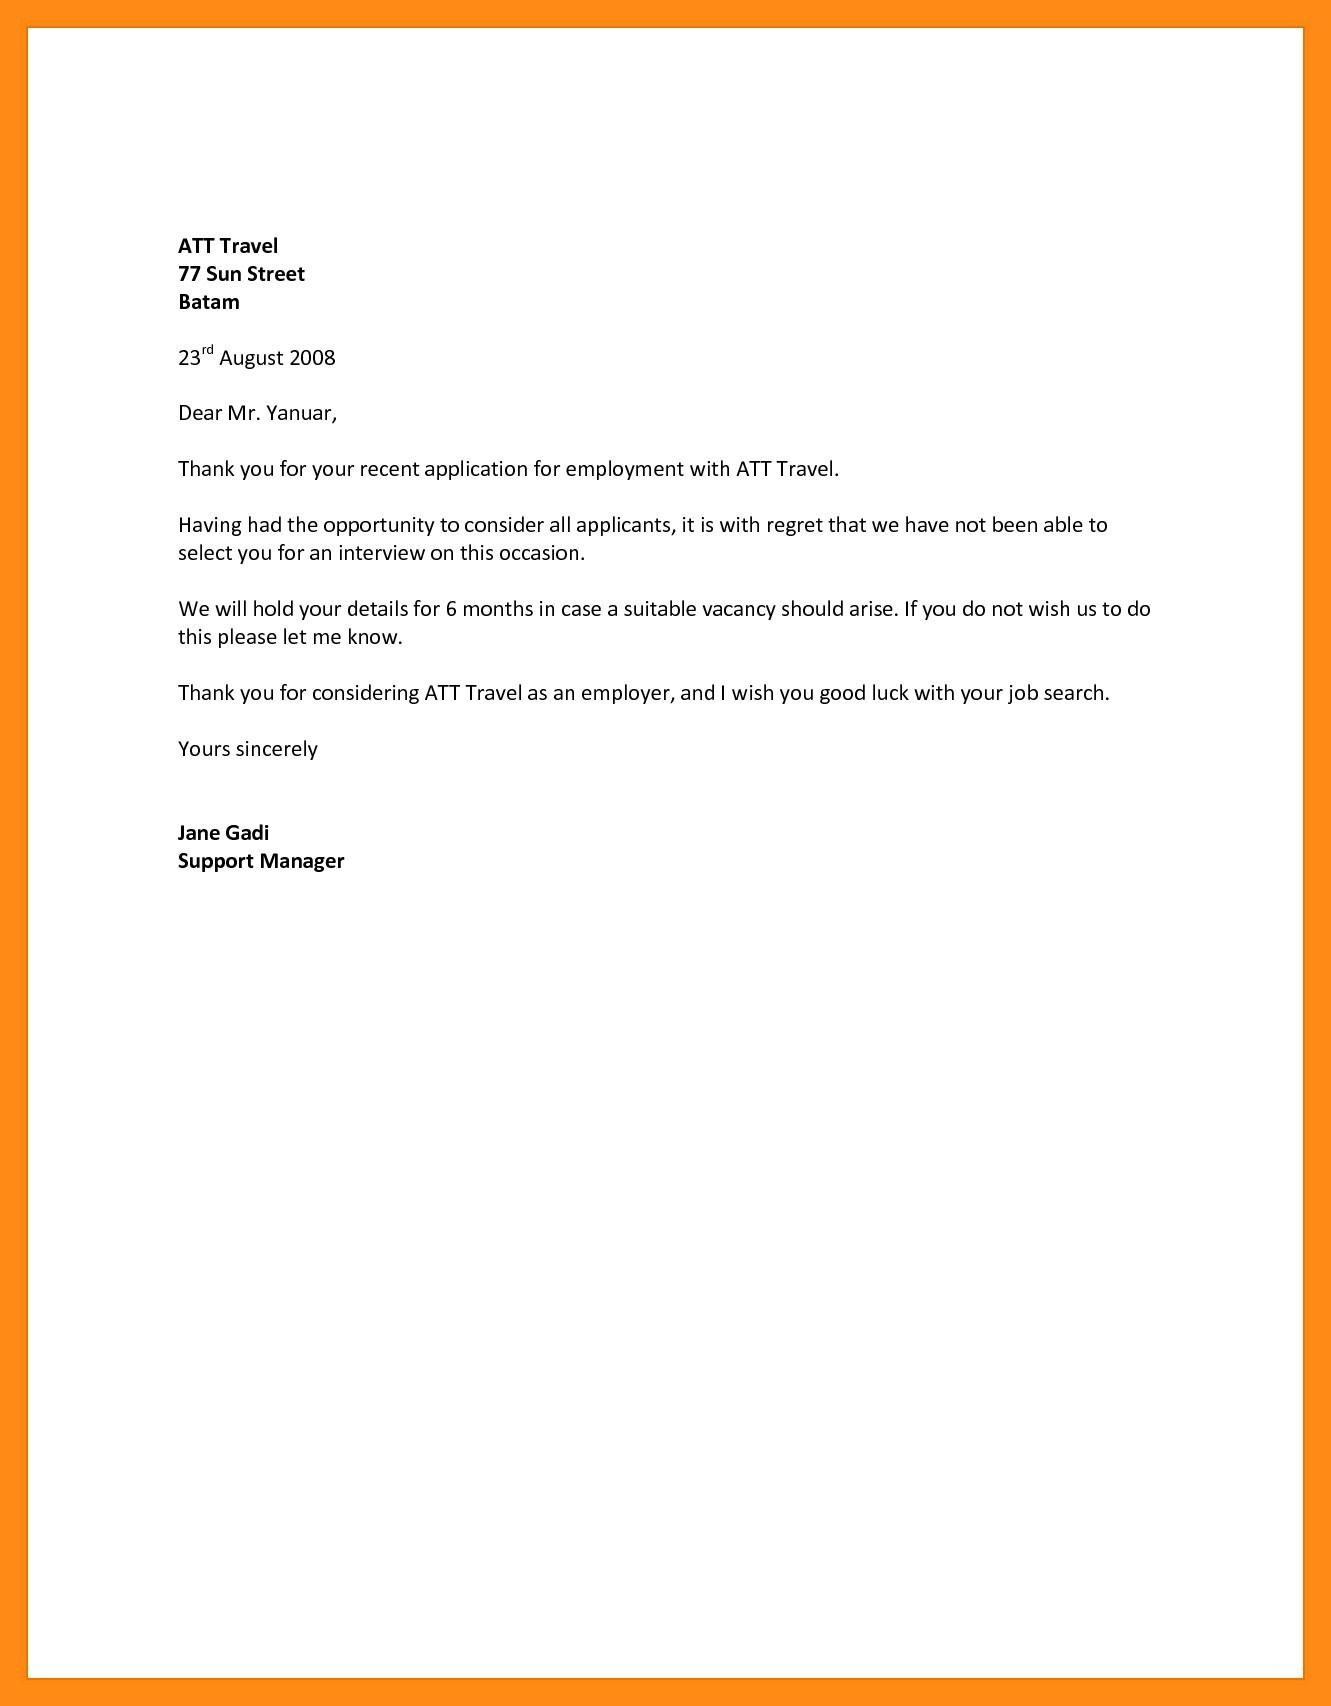 Employment Rejection Letter Template - Decline Letter Sample Invitation Letter format Sample